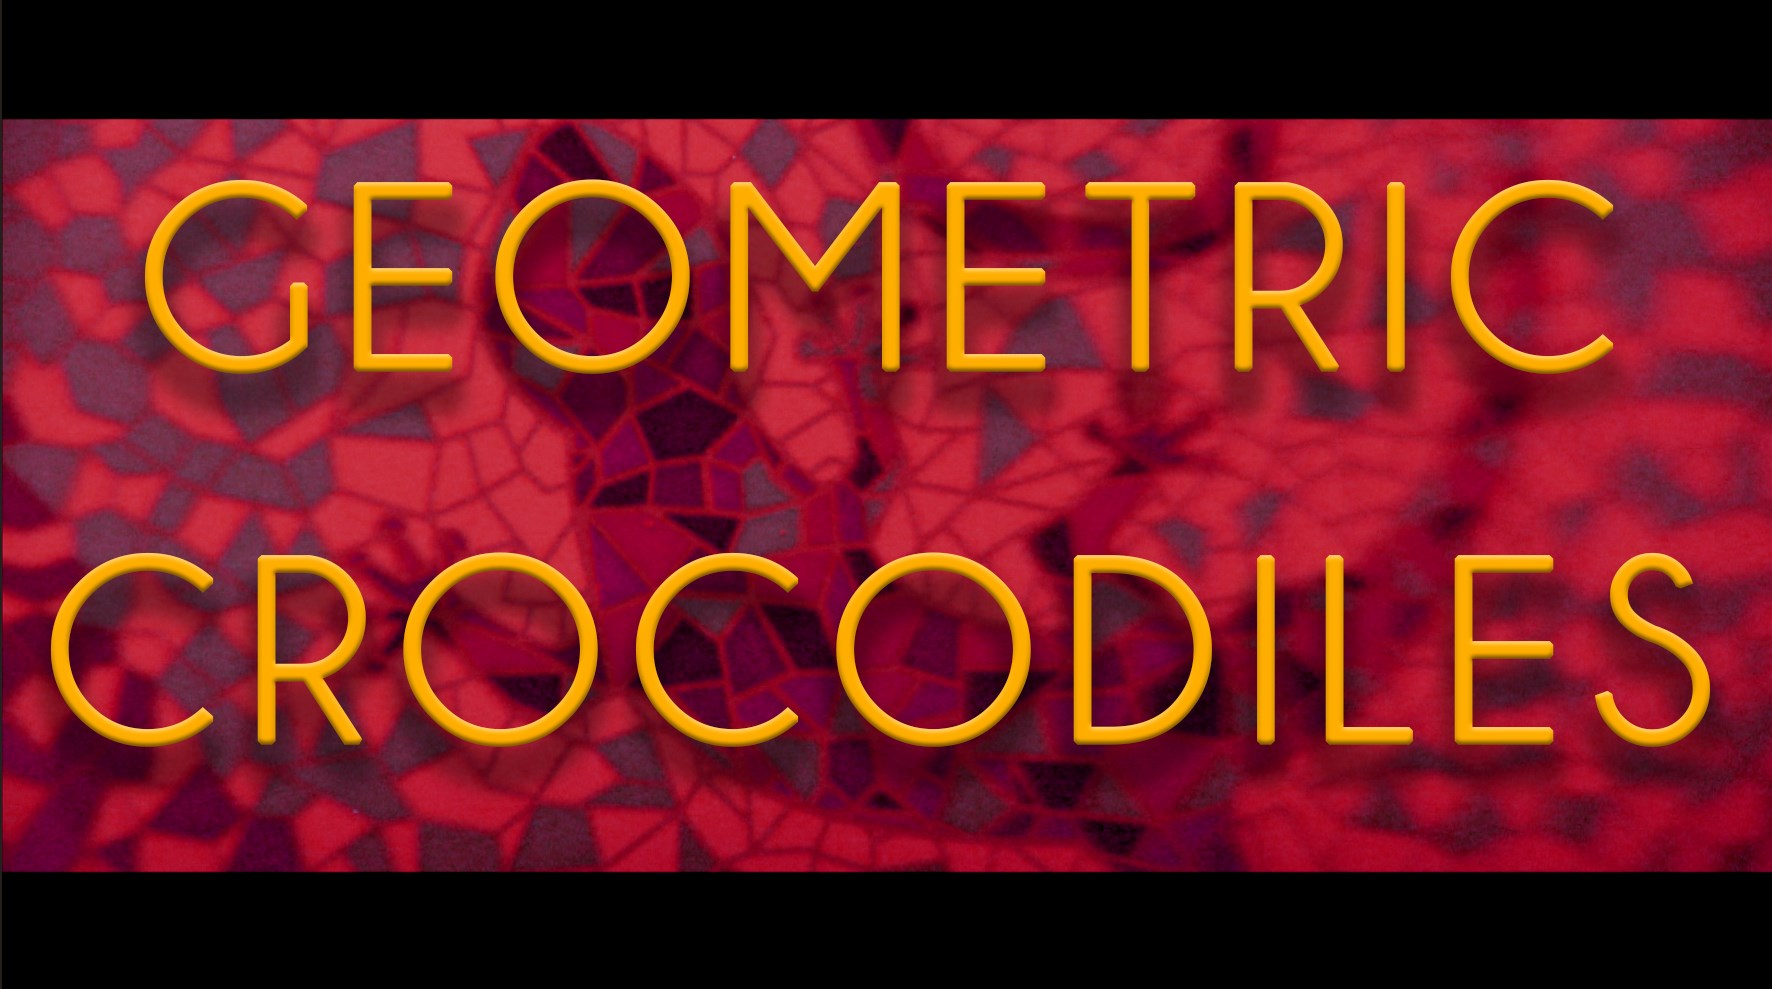 Geometric Crocodiles - My Rode Reel 2020